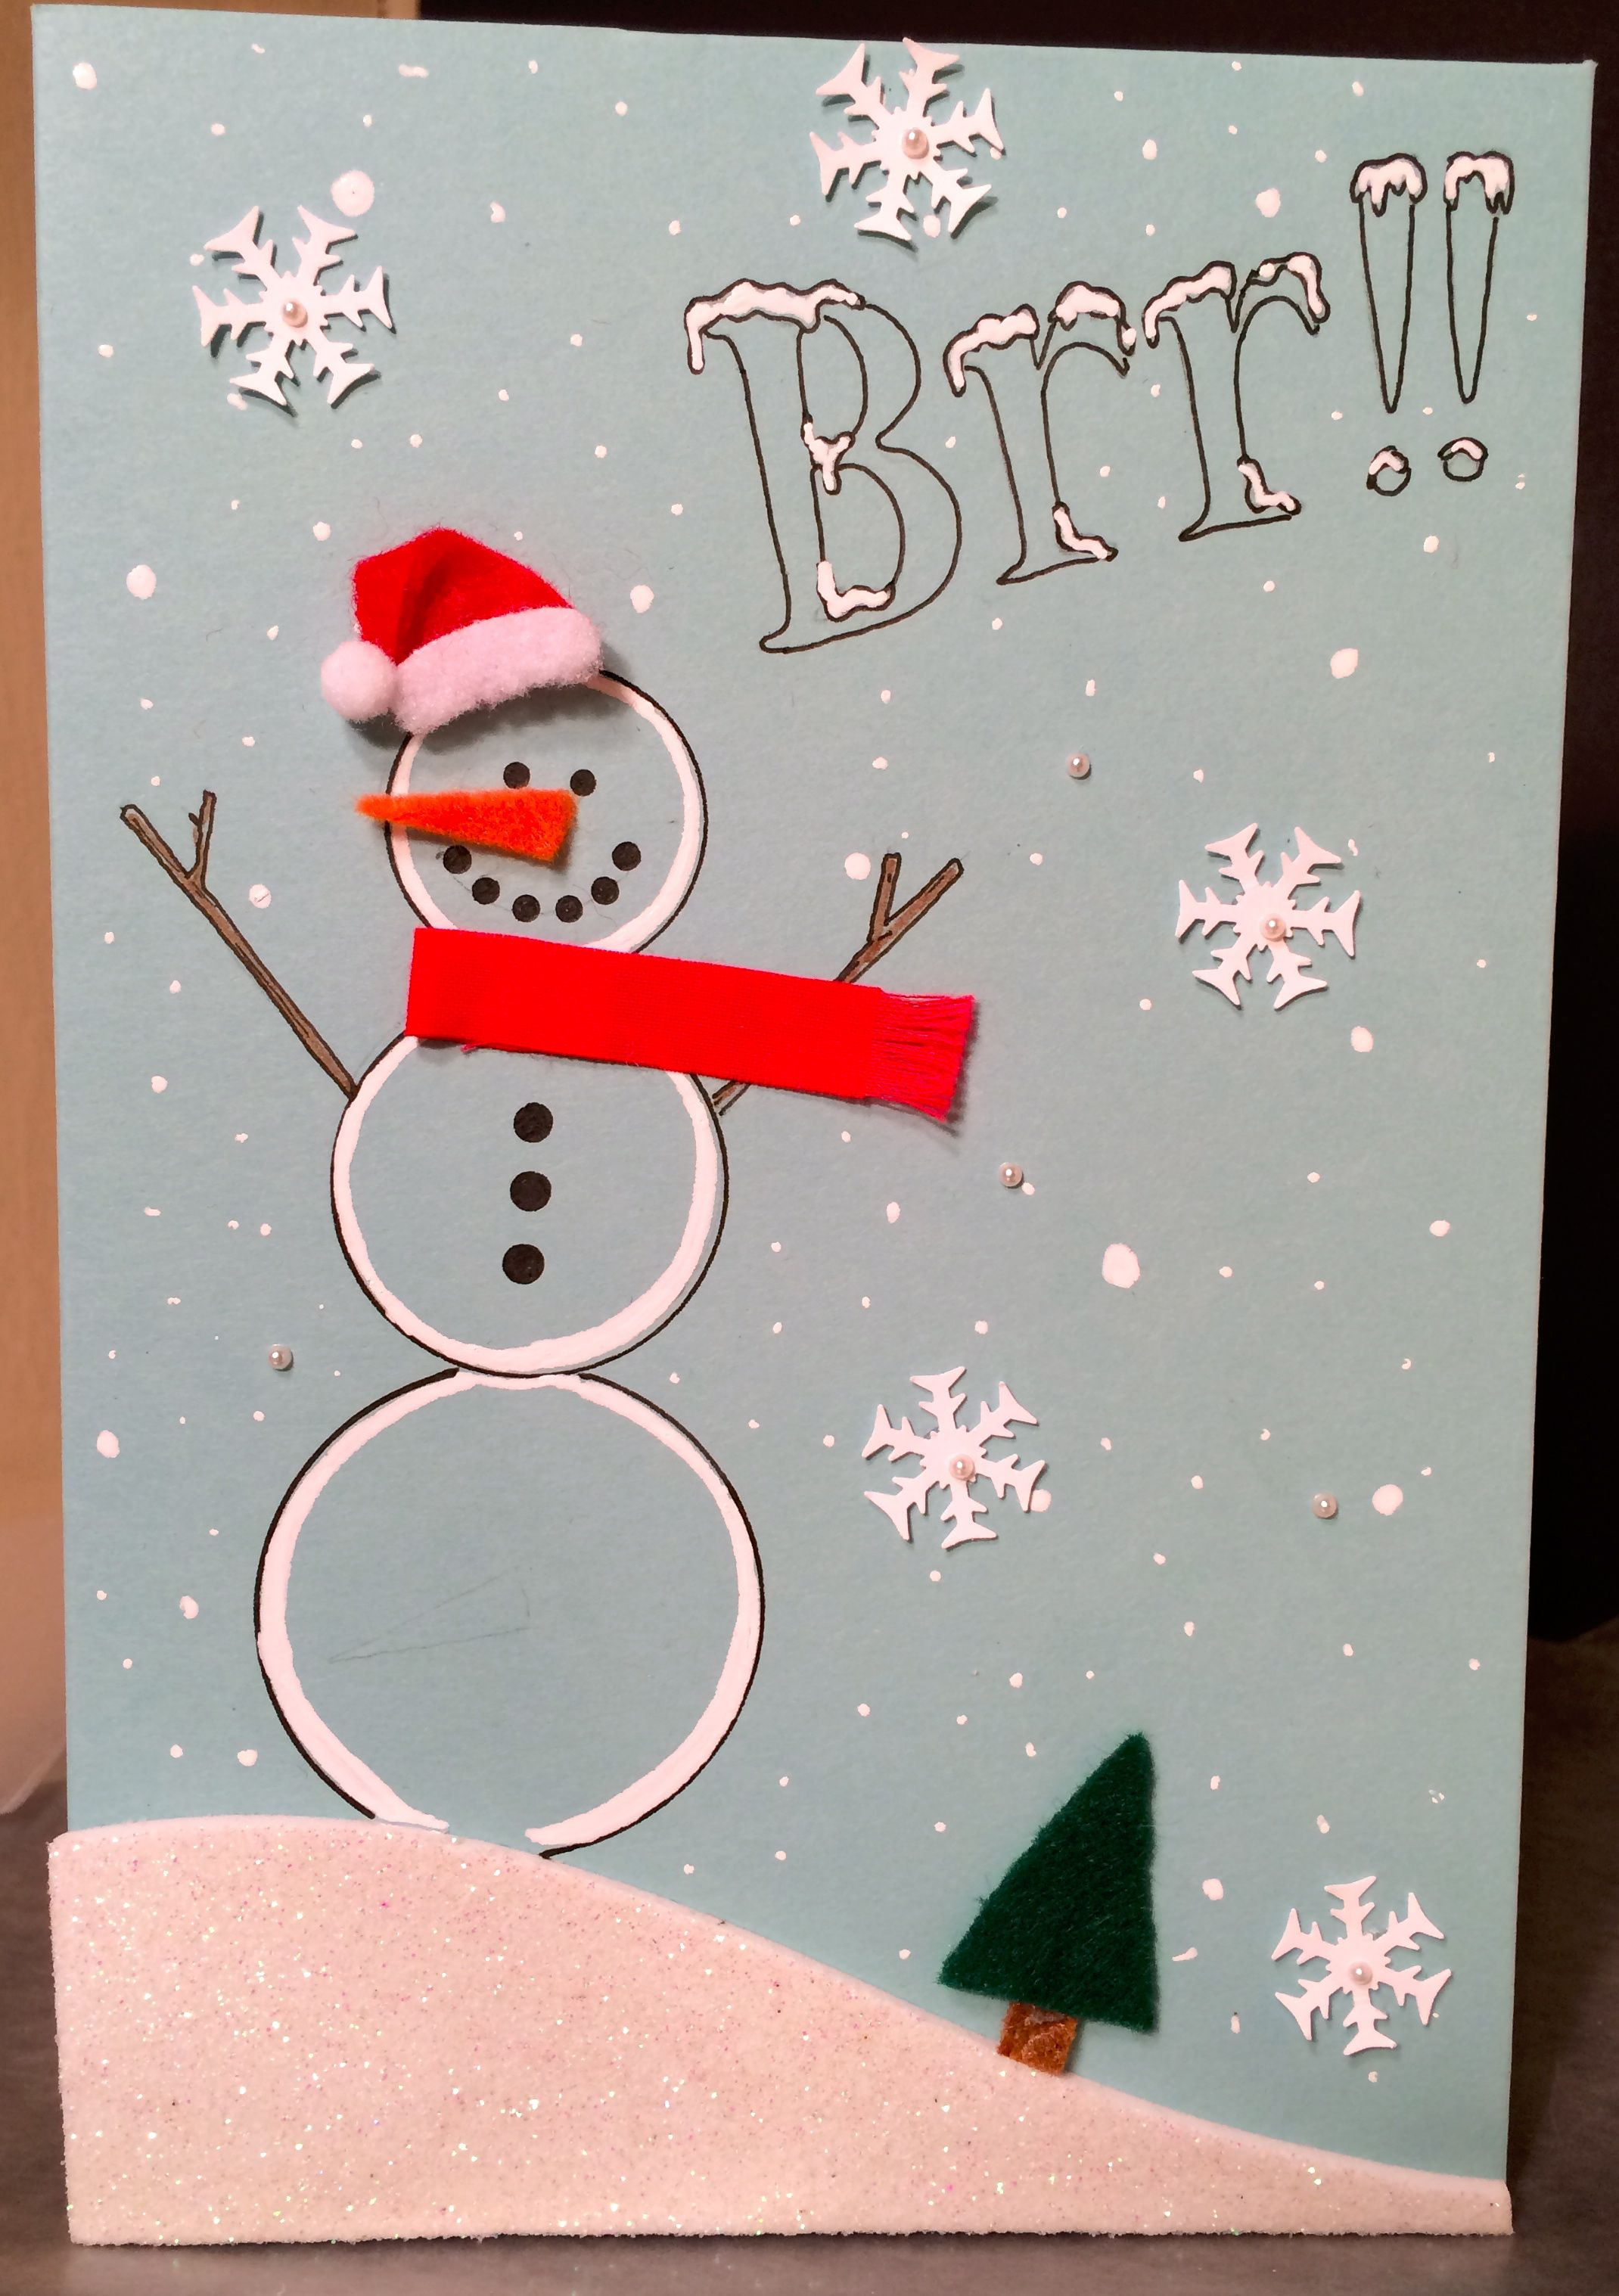 Handmade Christmas Card By Sonya Fedele | Handmade Christmas cards ...